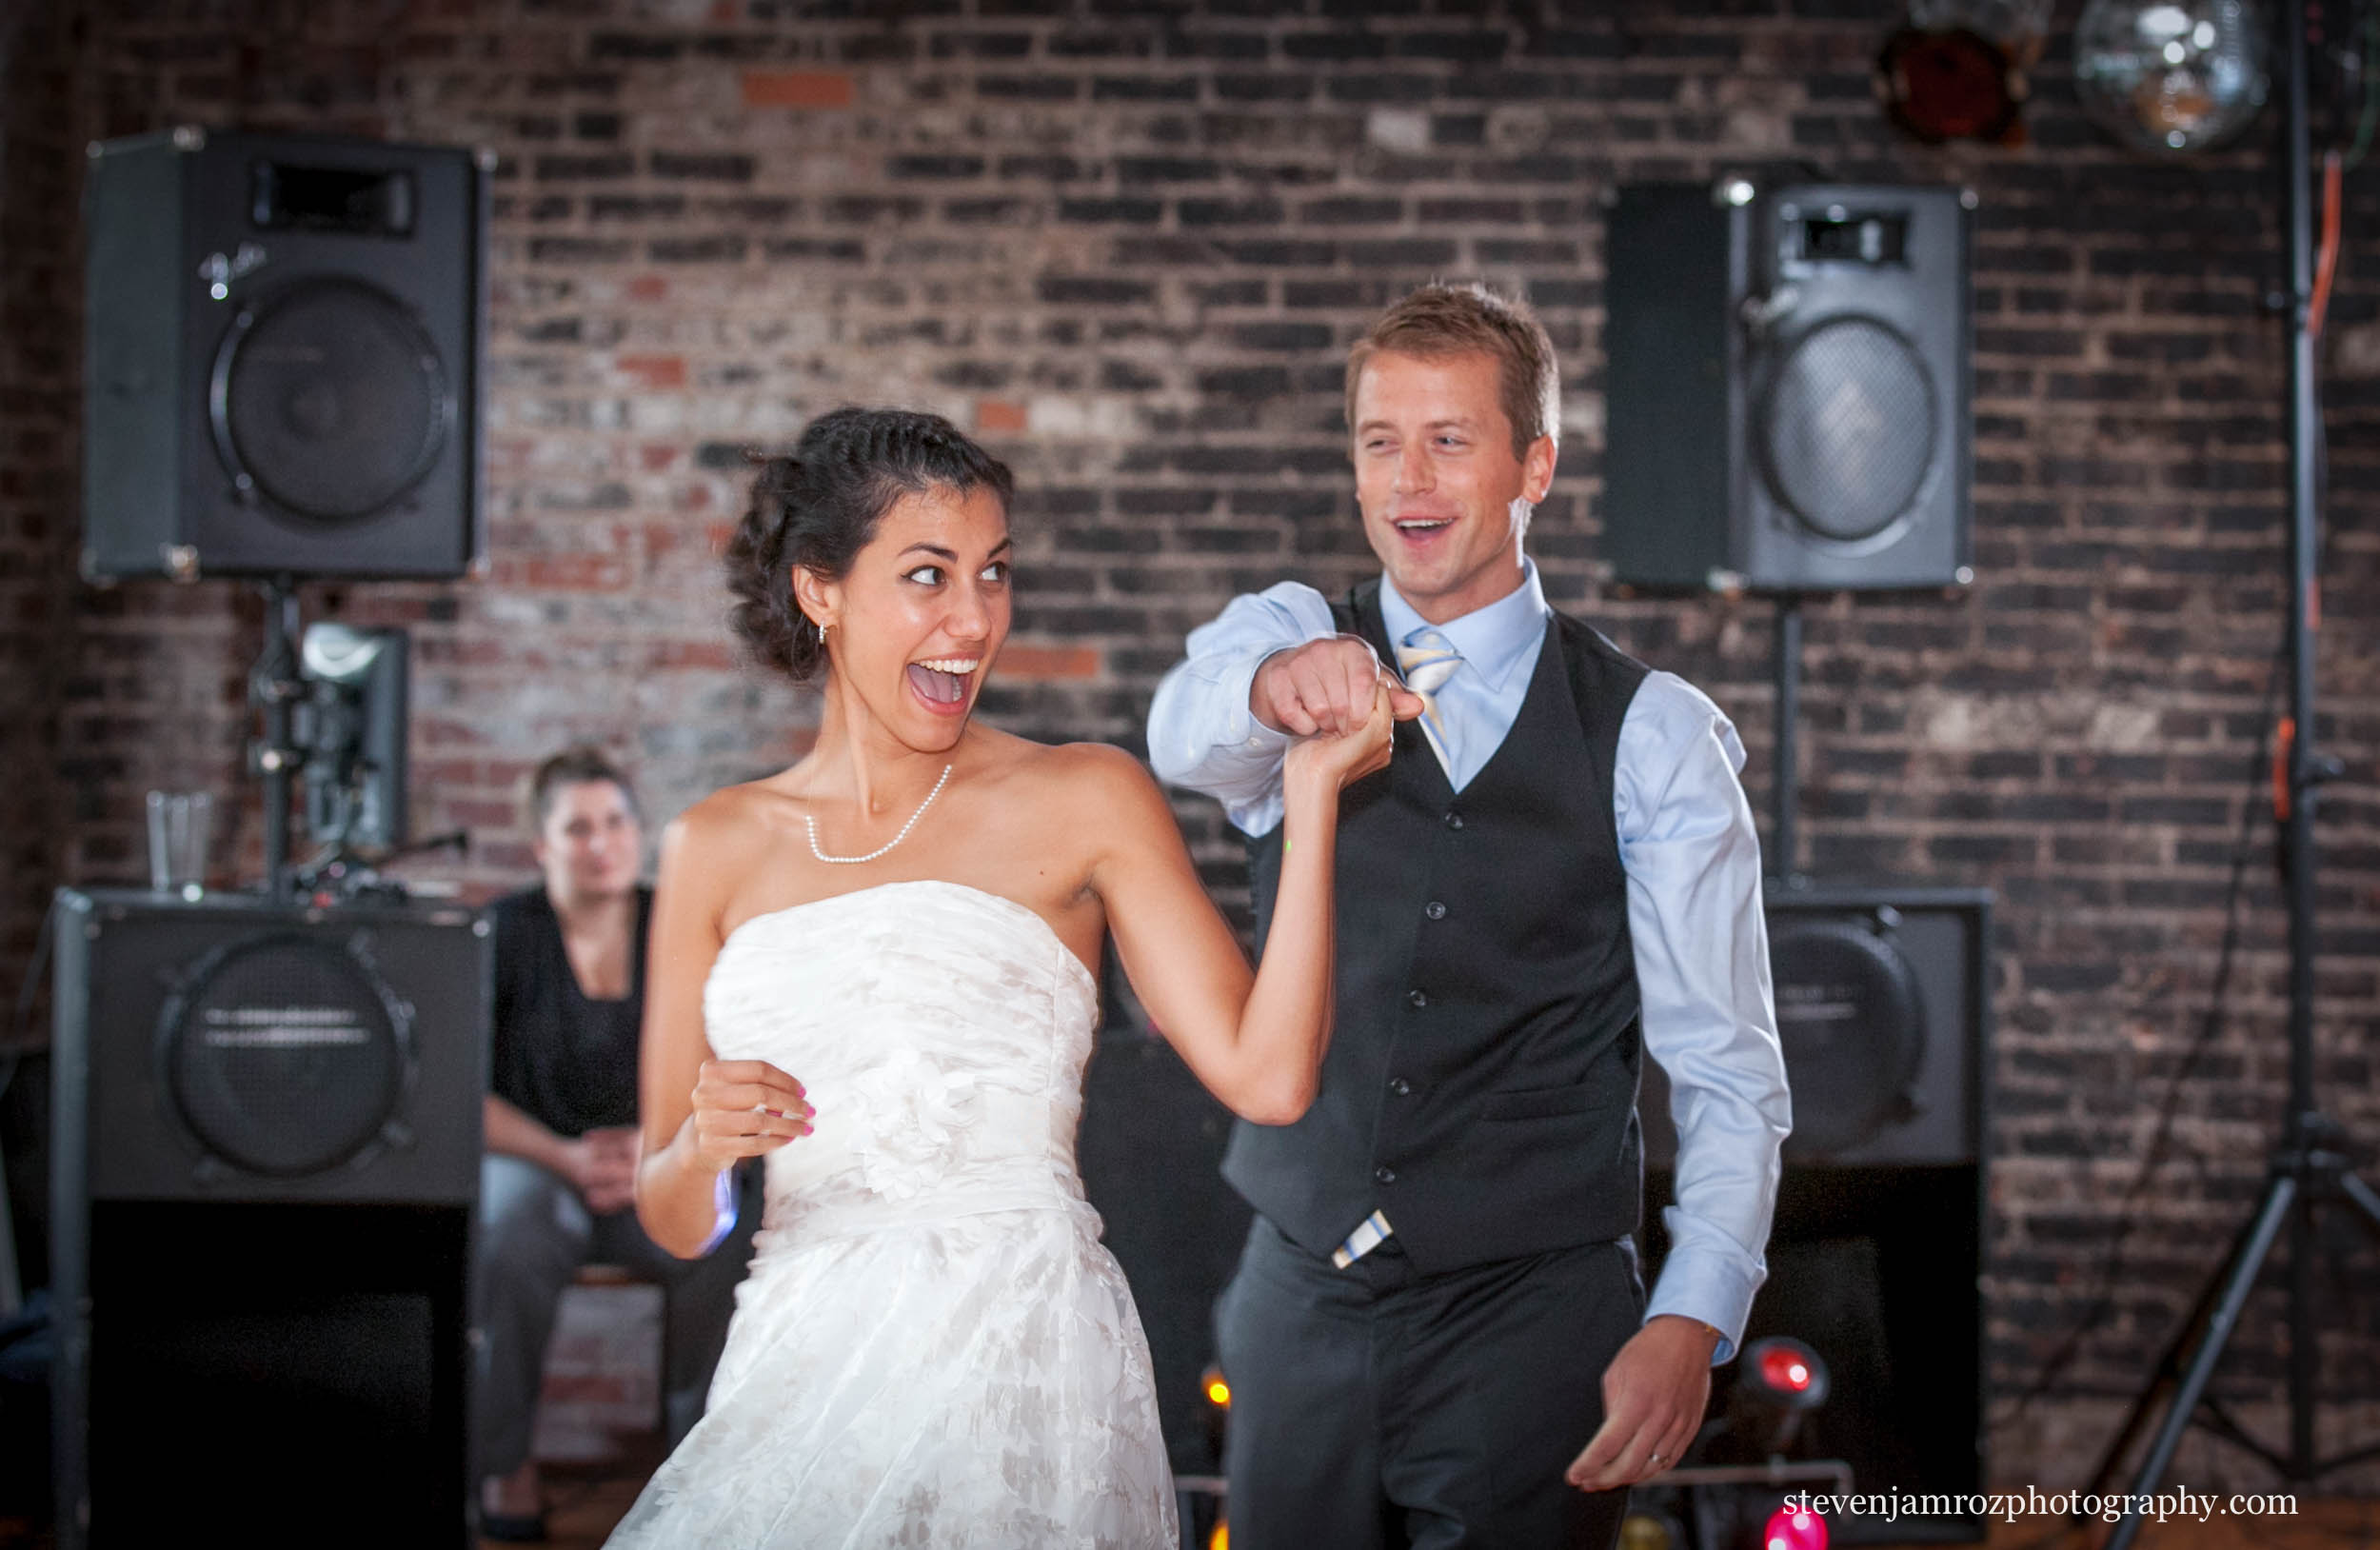 happy-dancing-stockroom-230-wedding-raleigh-steven-jamroz-photography-0074.jpg